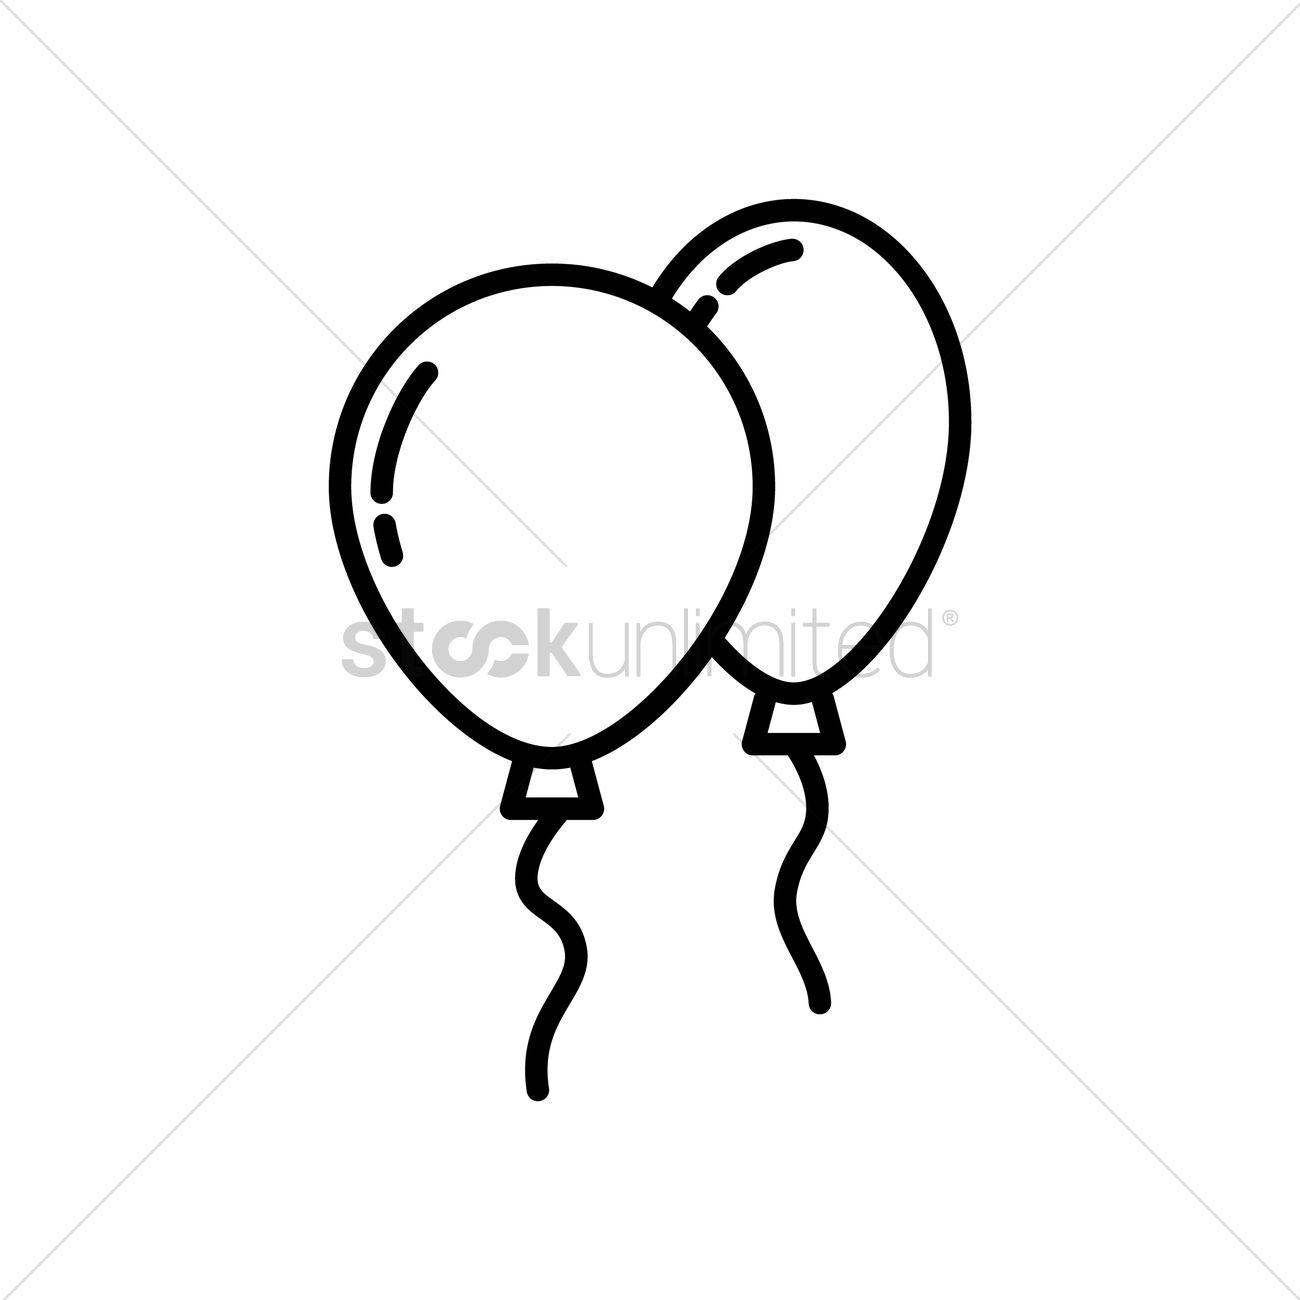 1300x1300 Helium Balloons Vector Image